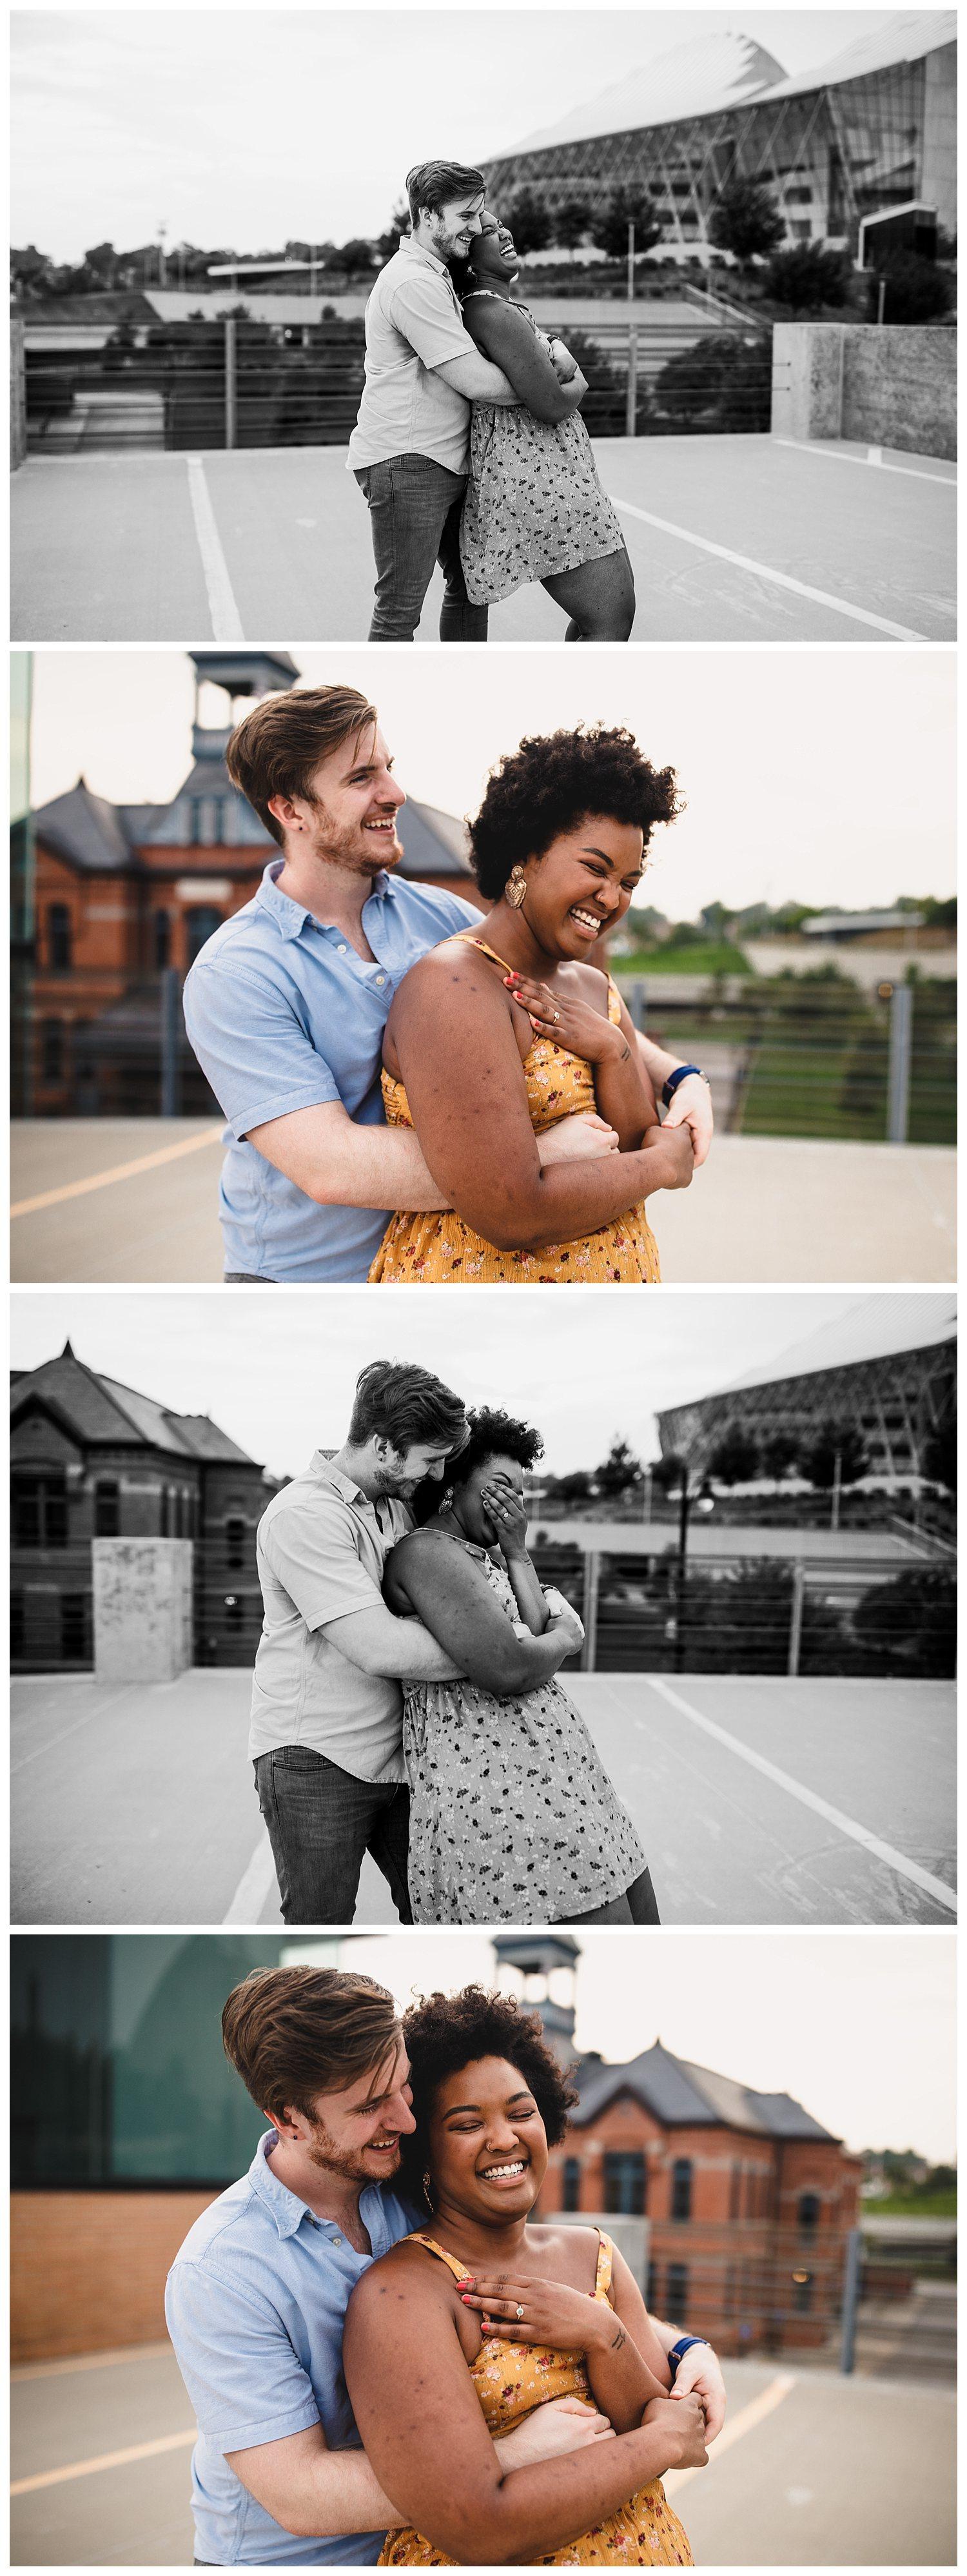 Kelsey_Diane_Photography_Kansas_City_Engagement_Wedding_Photographer_Midwest_Traveling_Missouri_Bri_Tyler_Arcade_Engagement_Up_Down_Kansas_City_Crossroads_District_0799.jpg